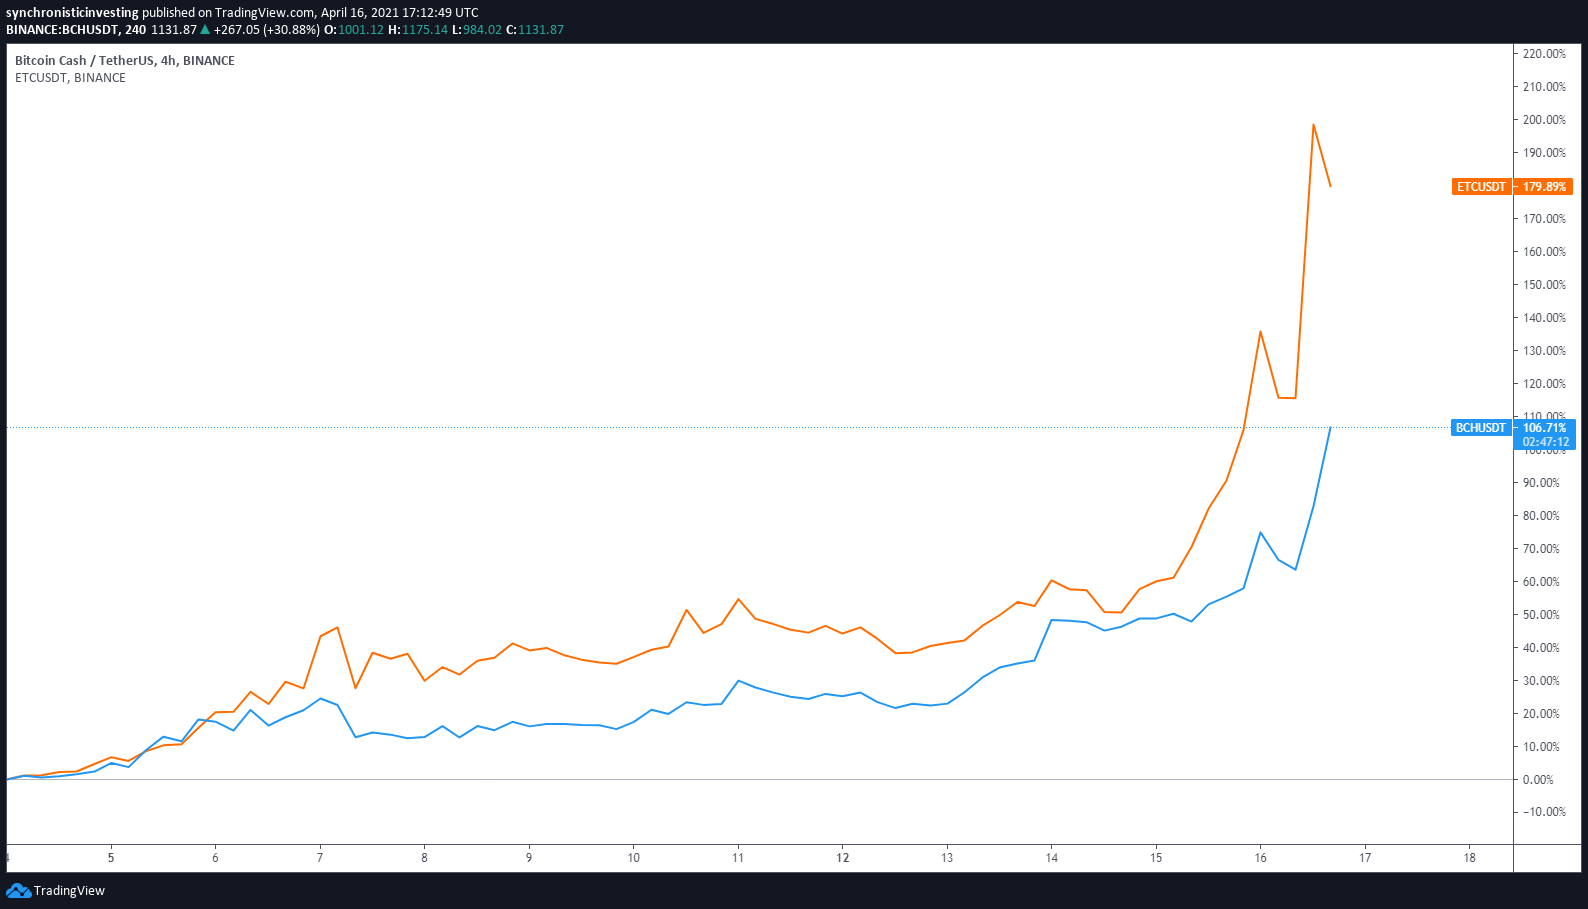 Grafico a 4 ore di BCH/USDT vs. ETC/USDT